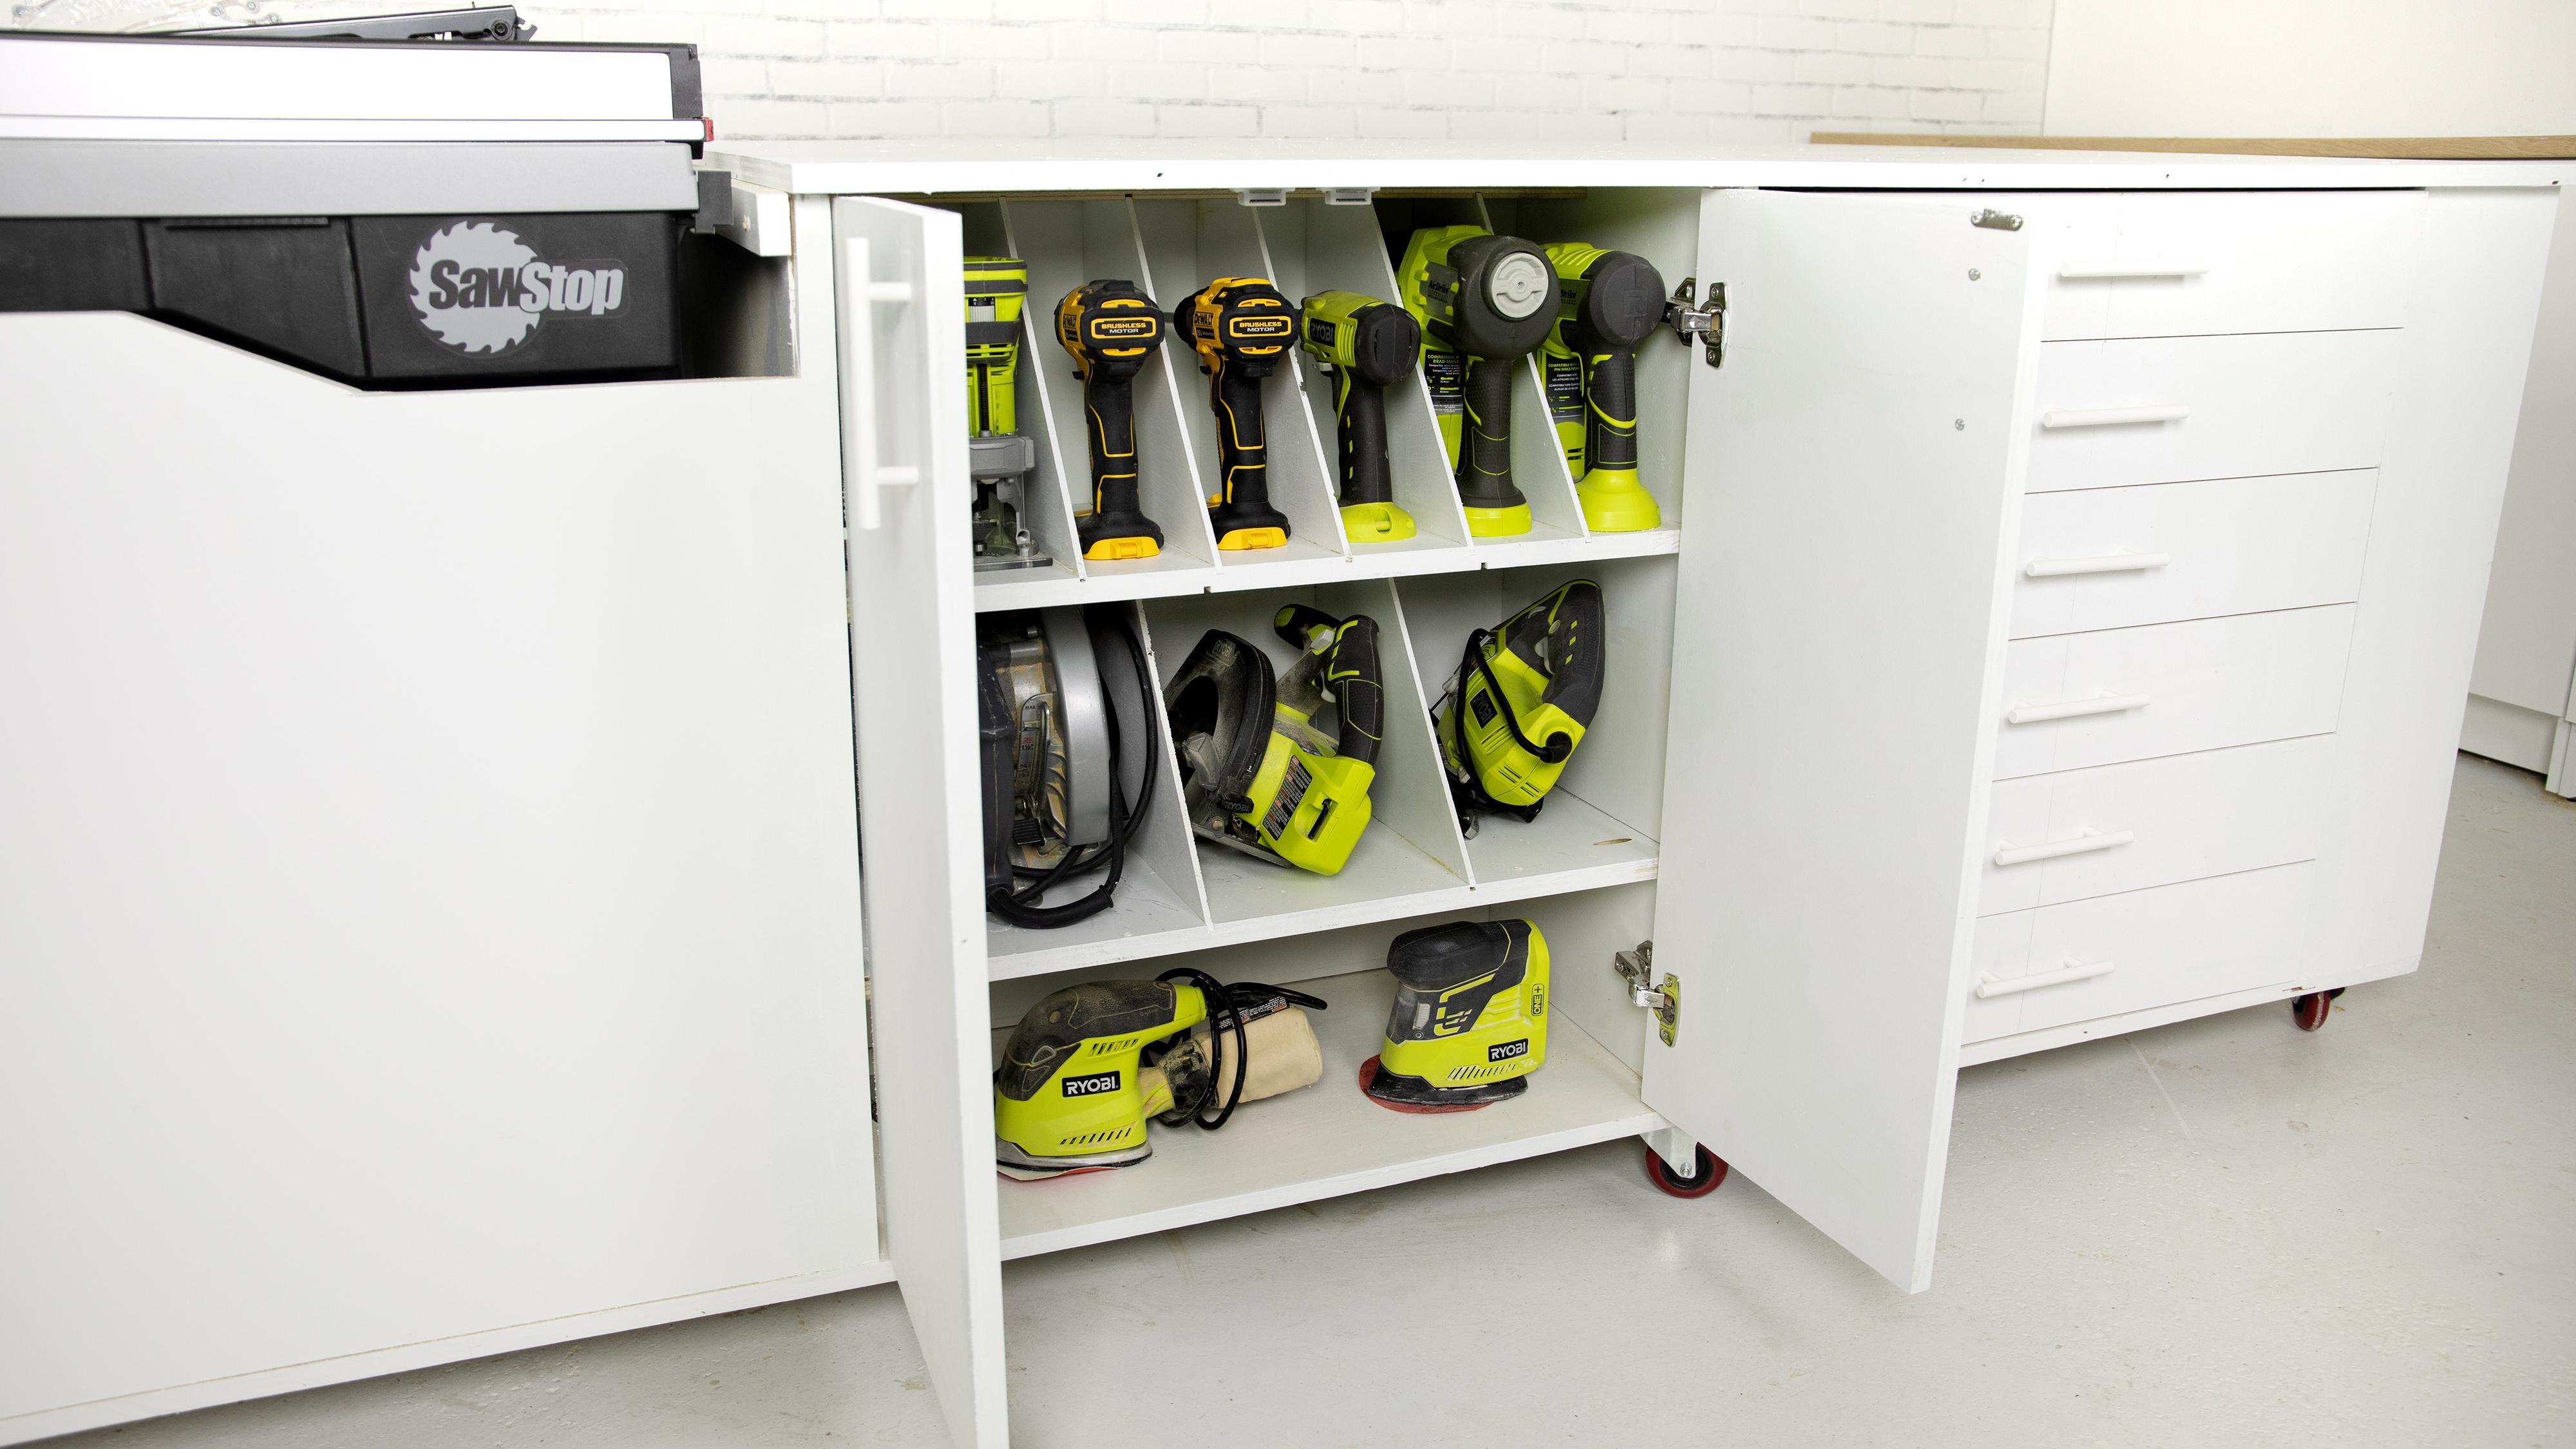 Mobile workbench tool organizer